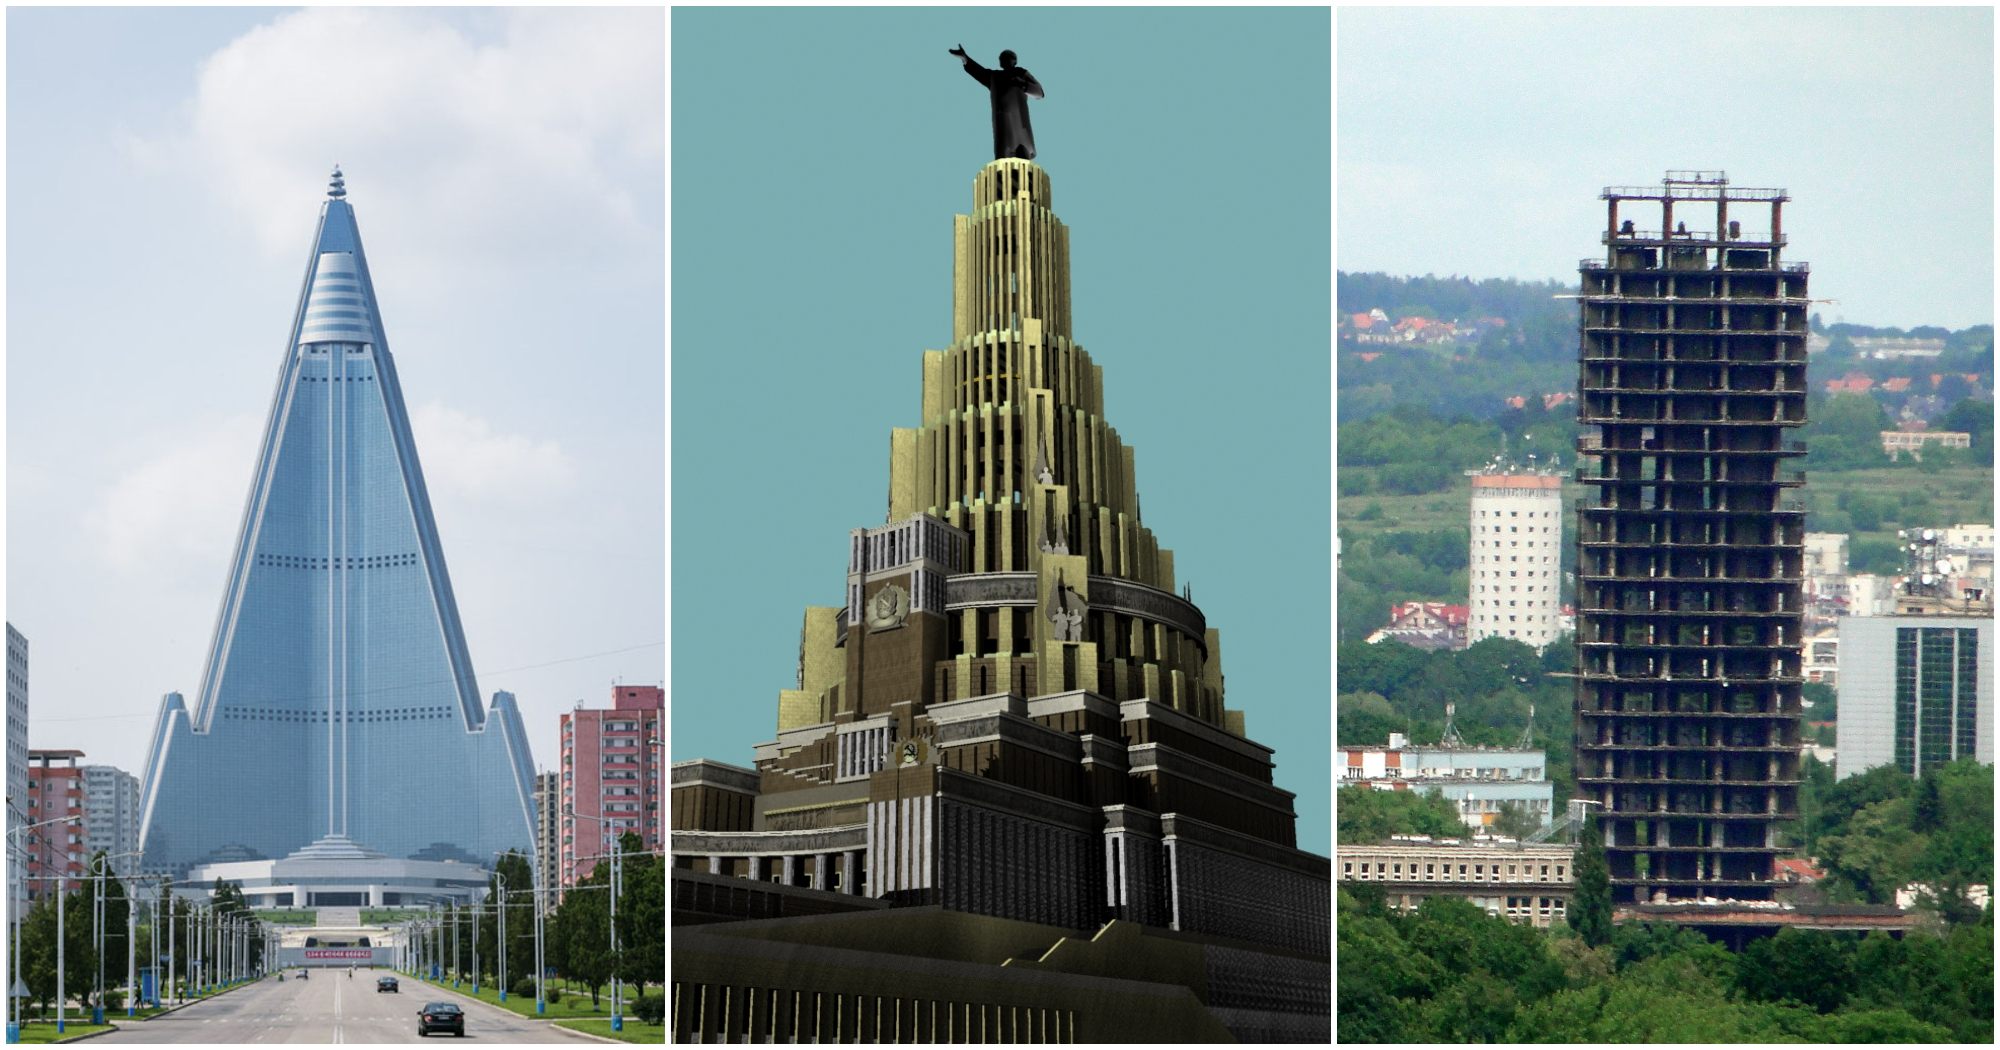 los 10 edificios inconclusos m u00e1s famosos de la historia